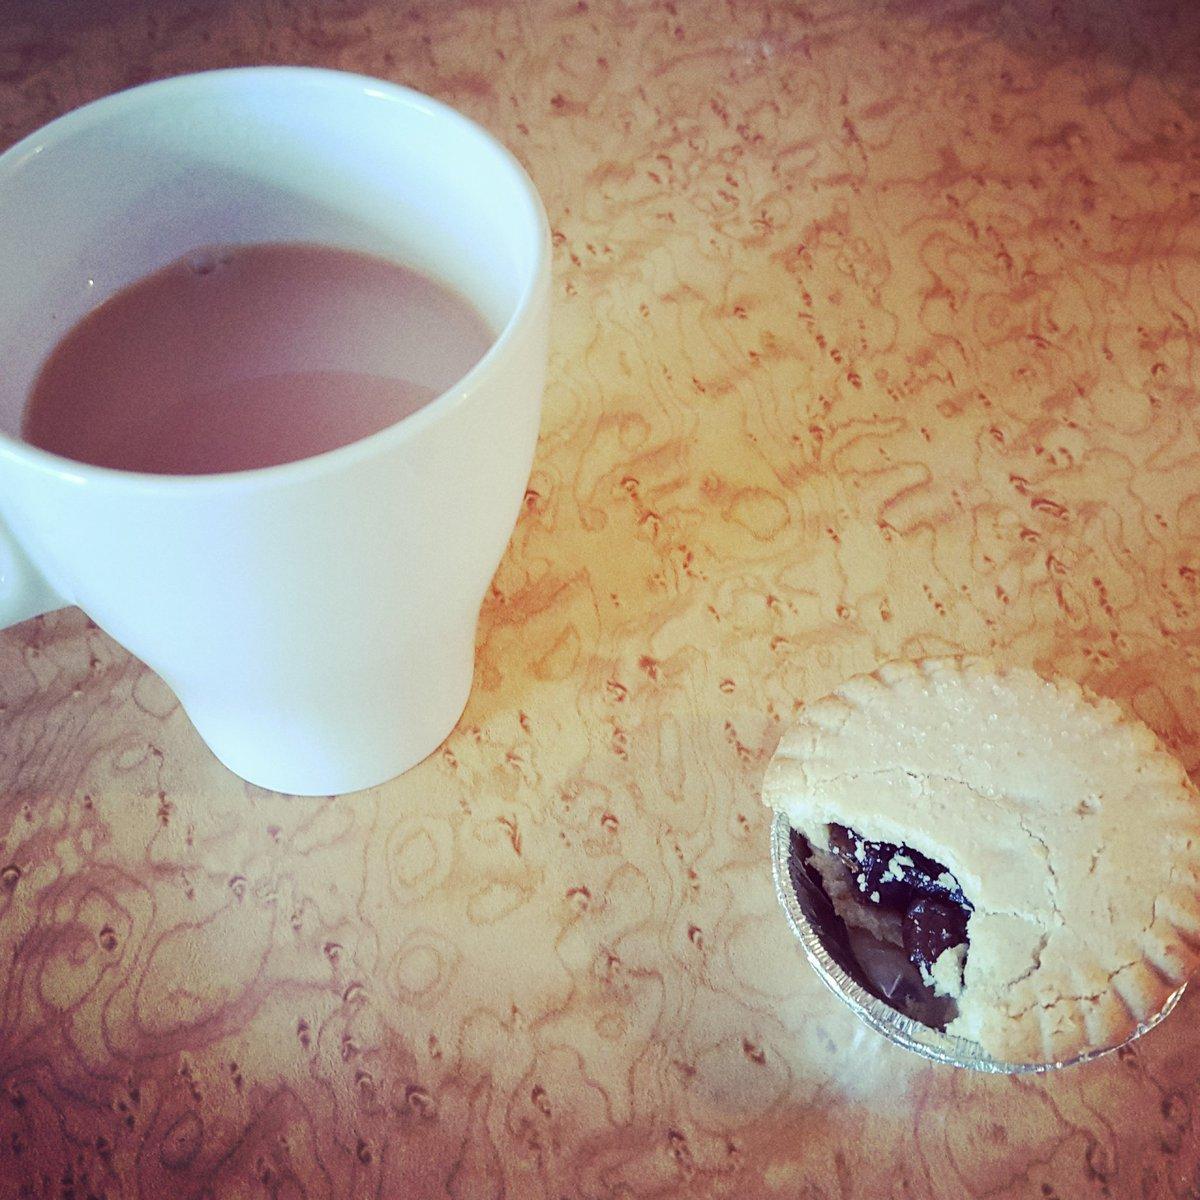 Standard break; cup of tea with a mince pie in May. https://t.co/tulFO2oP8H